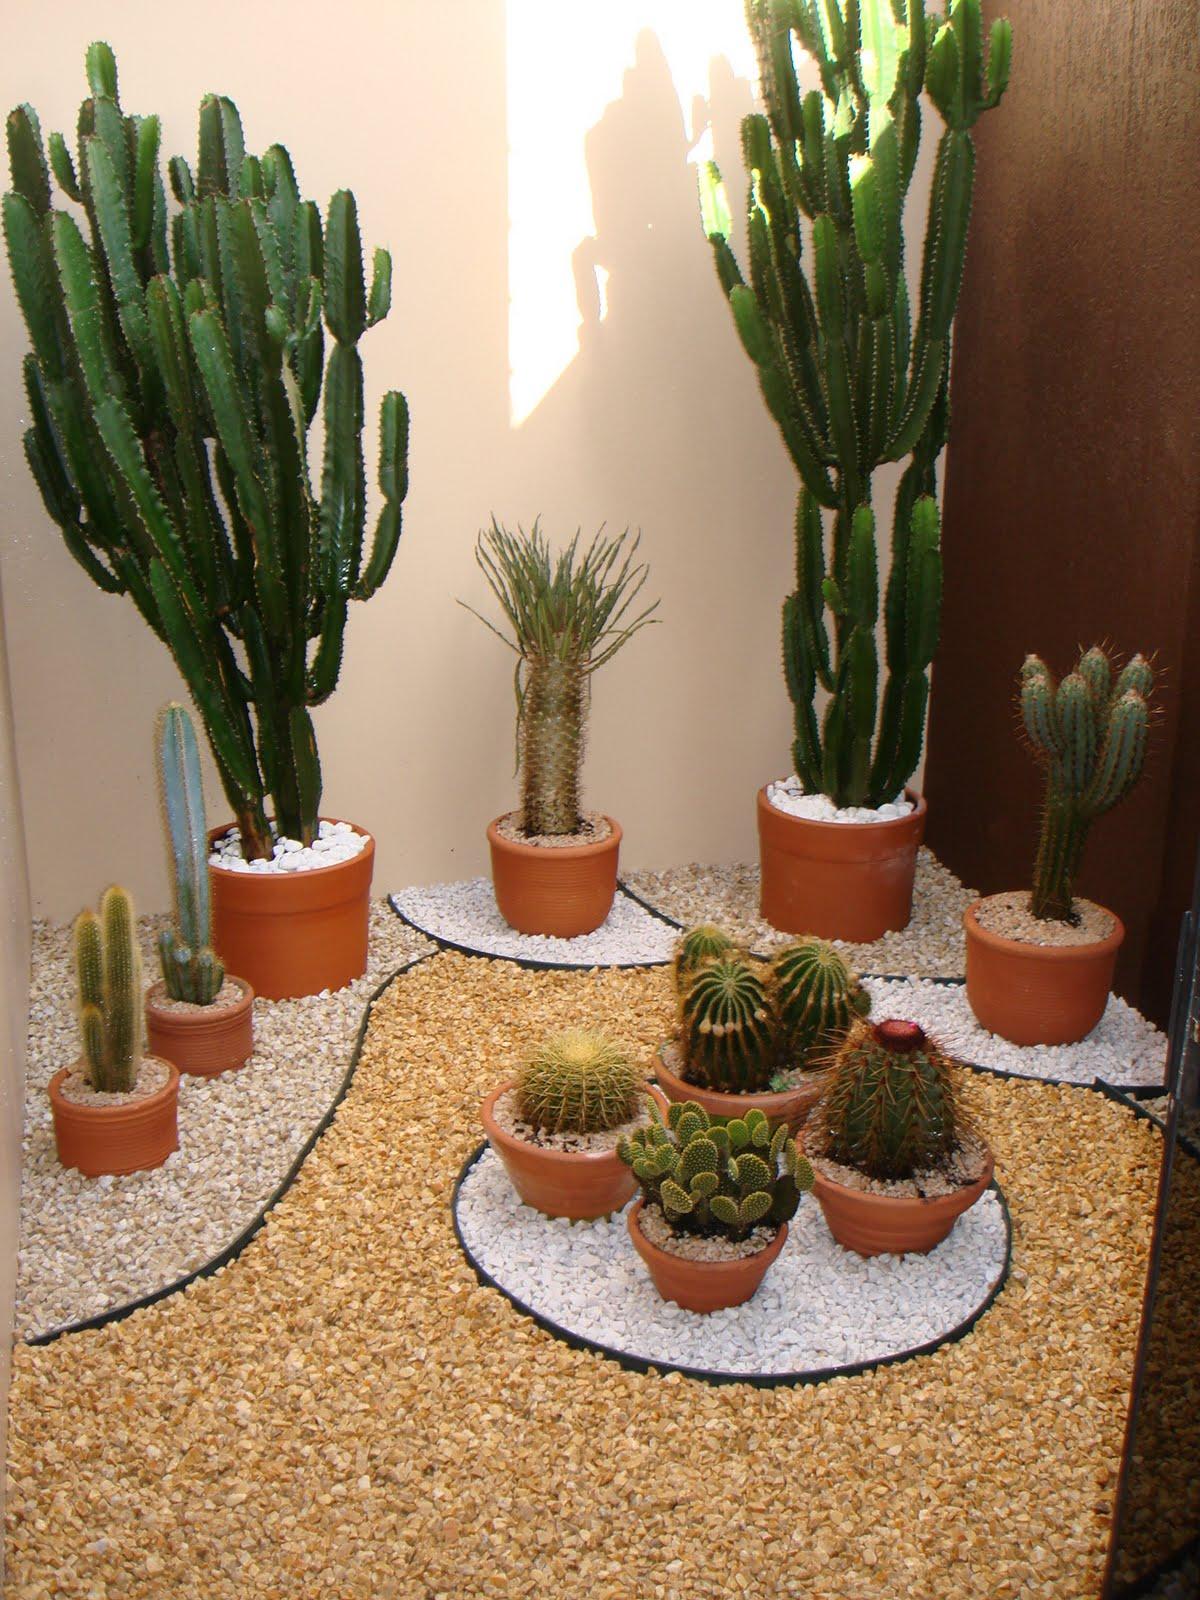 plantas jardim pequeno:Espero que gostem.